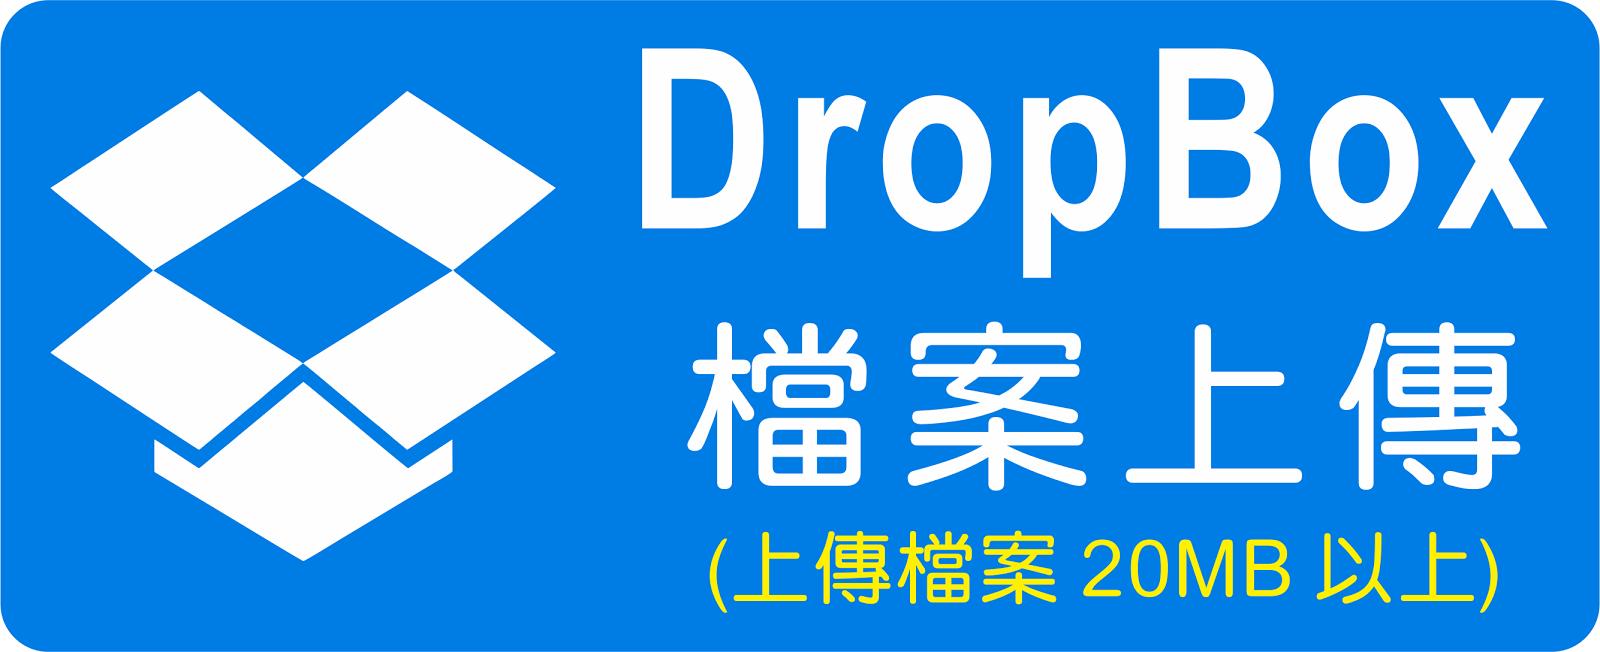 DROPBOX - 上傳檔案